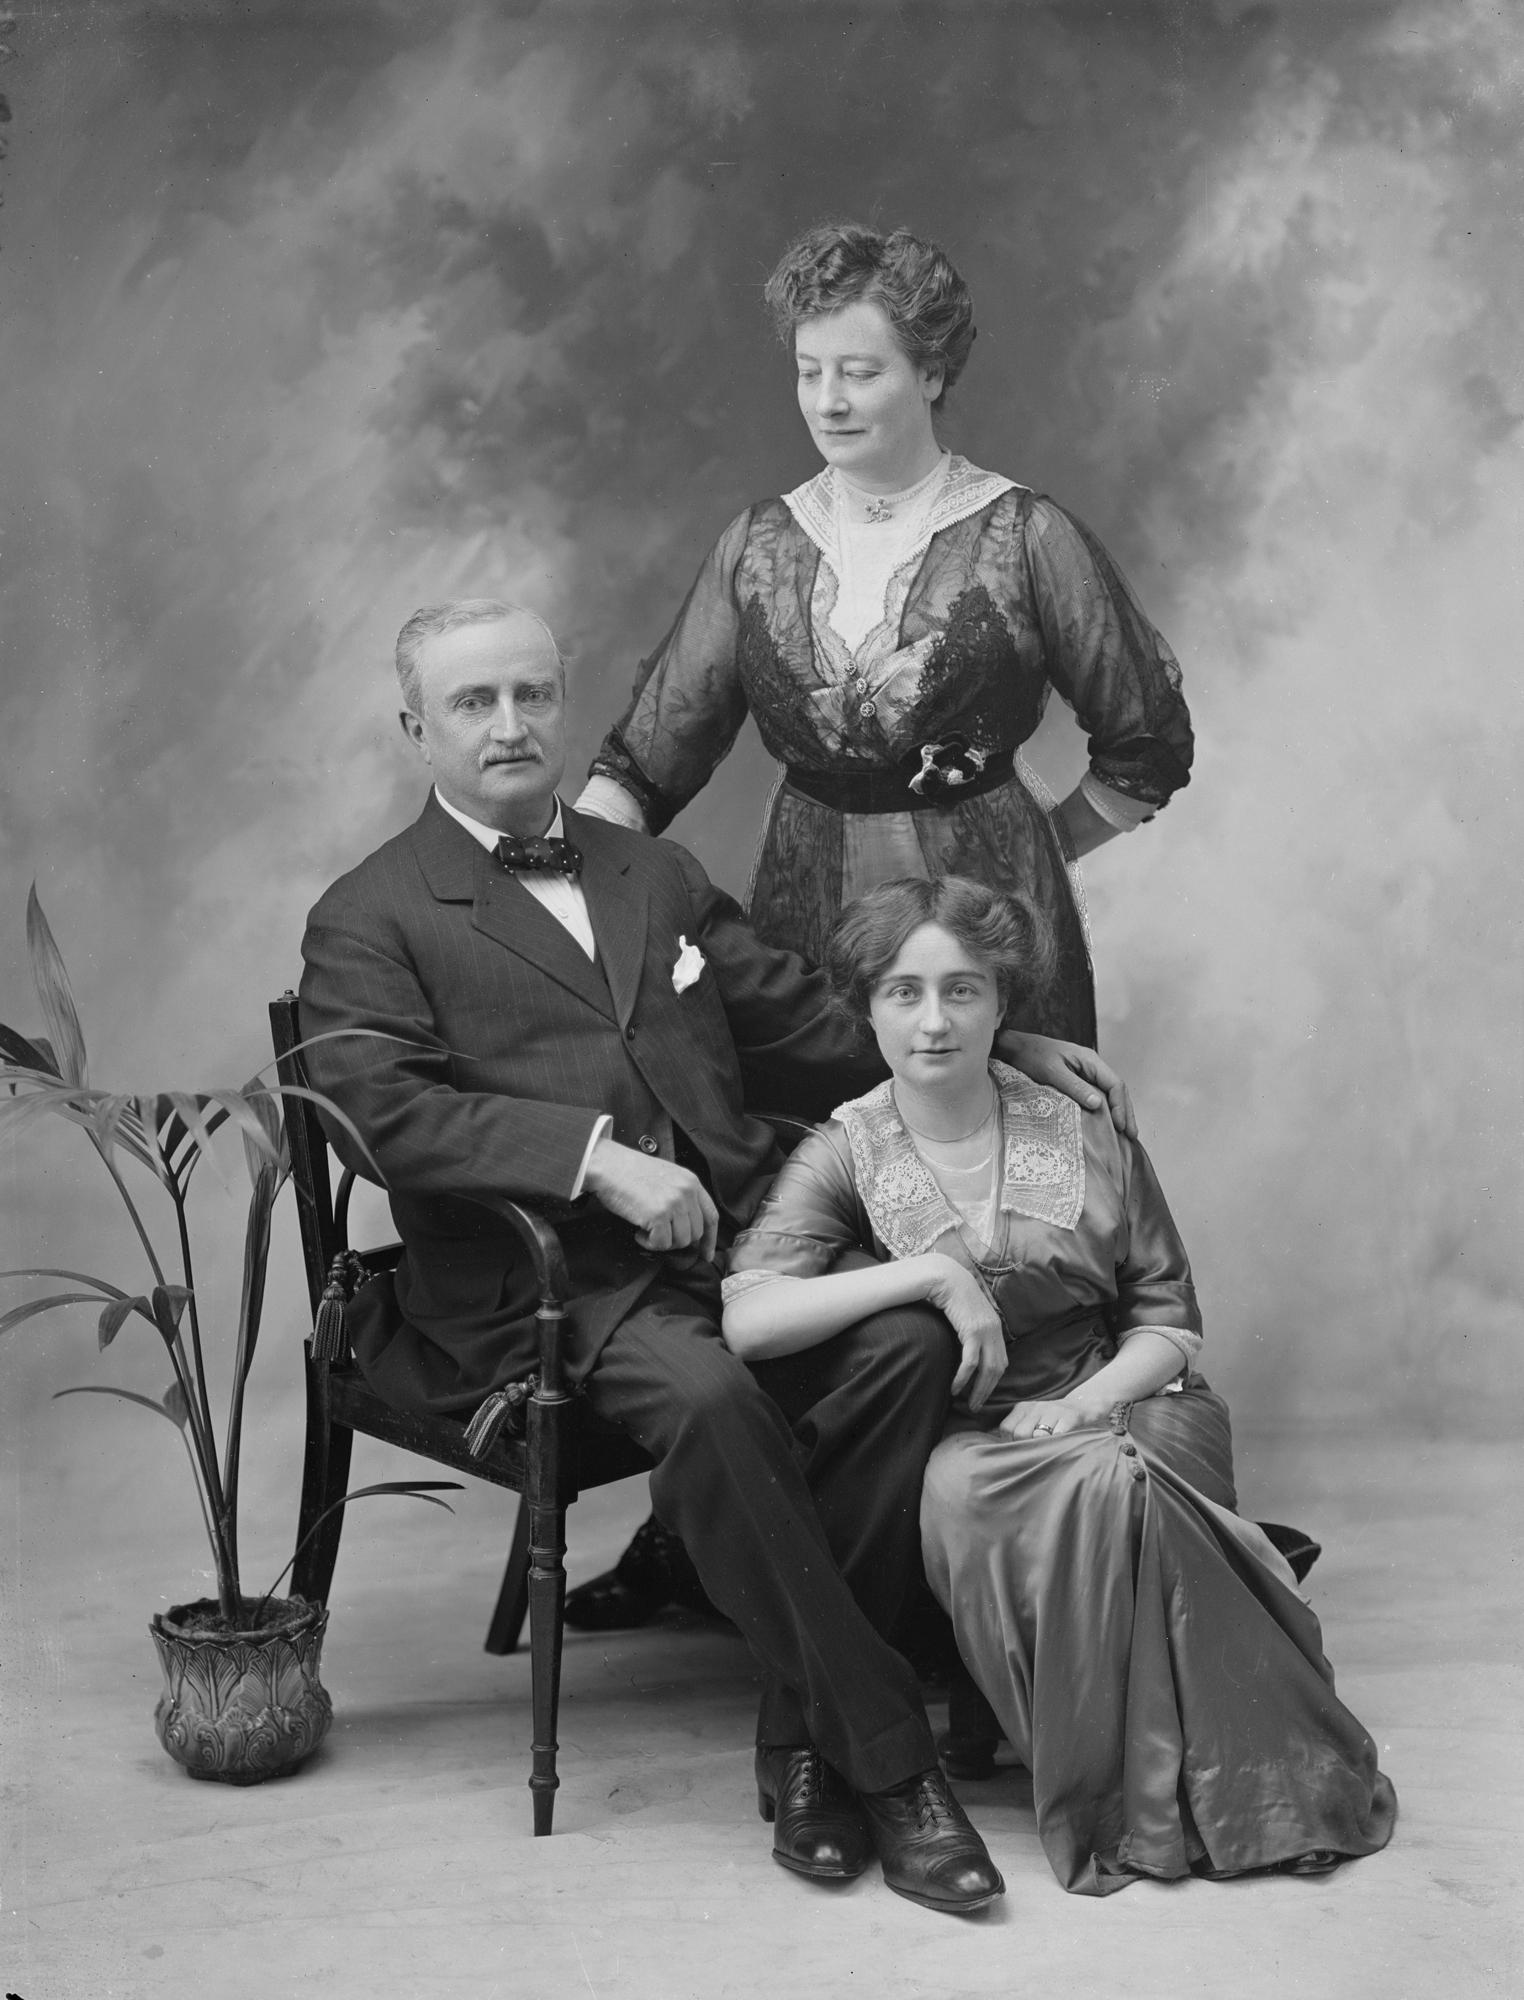 Mr. J. Redmond. M.P., Mrs. Redmond and girl